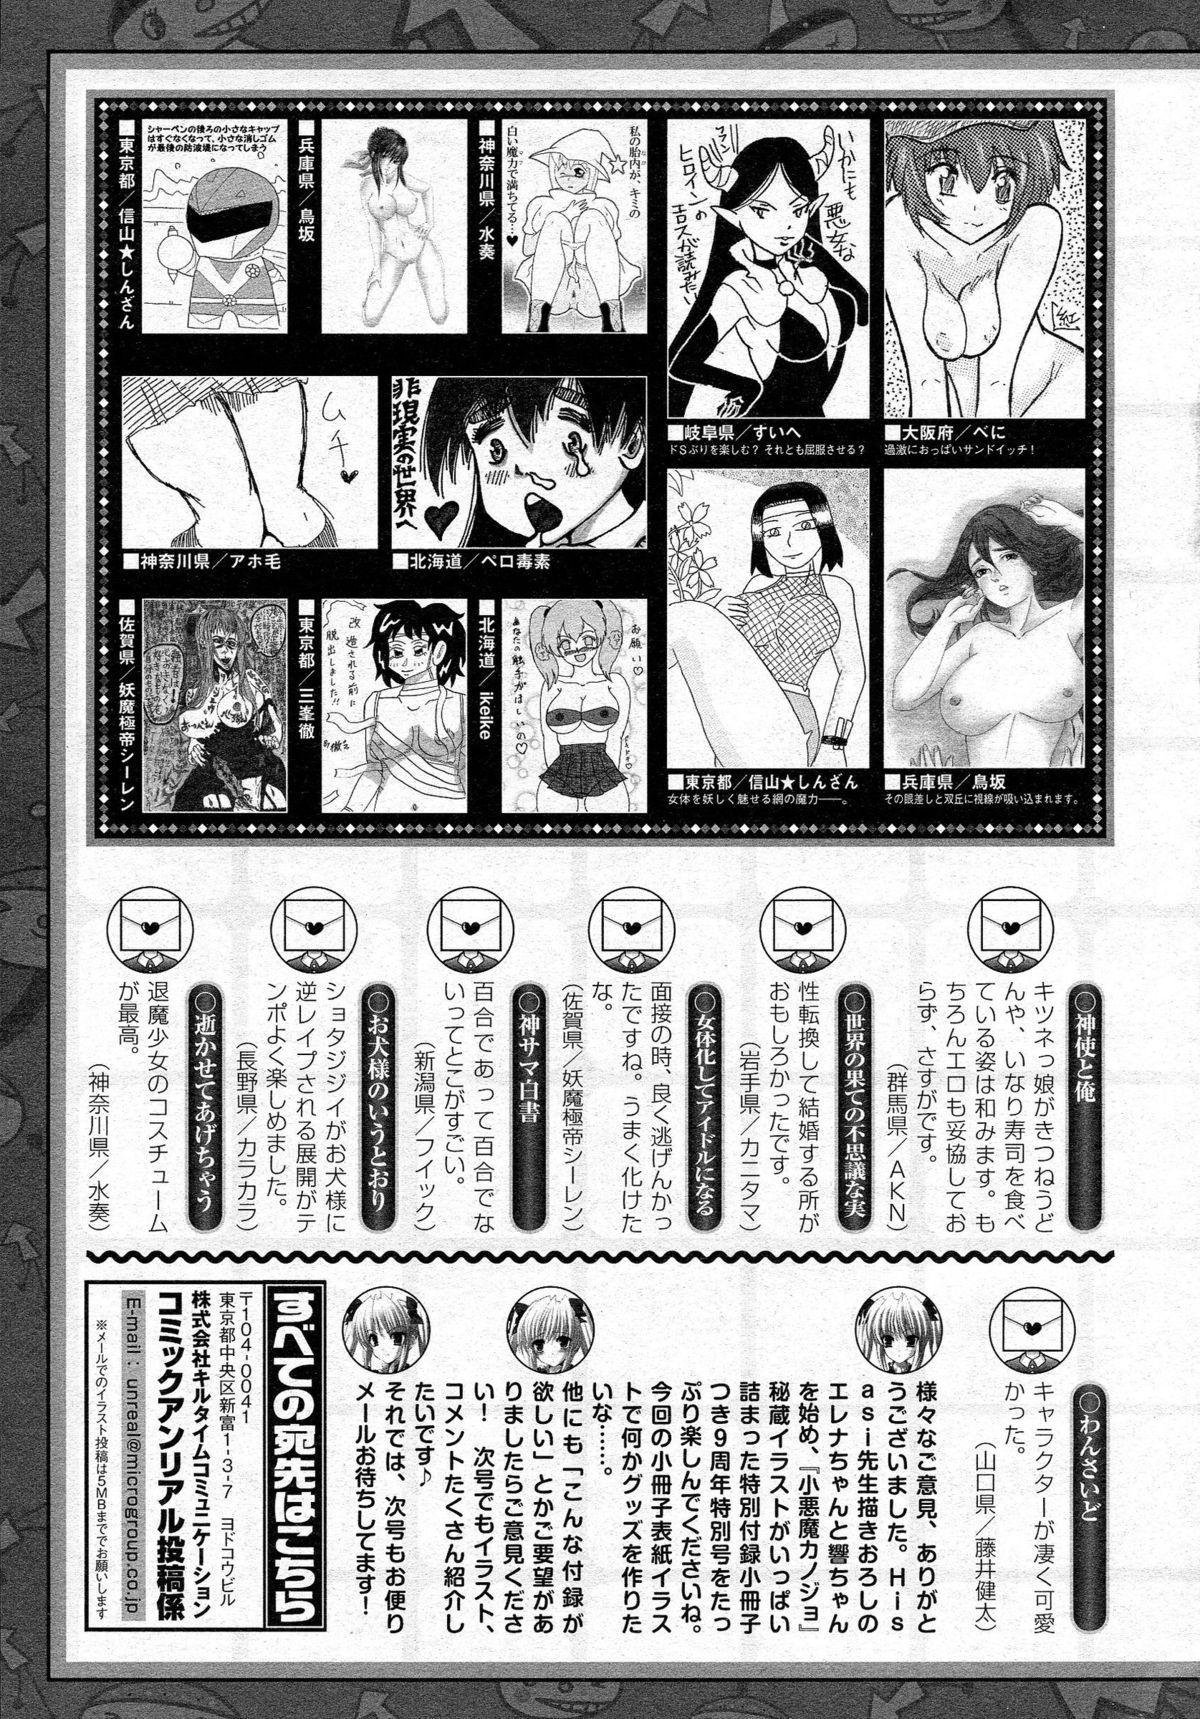 COMIC Unreal 2015-06 Vol. 55 + Hisasi Illust Shuu 450